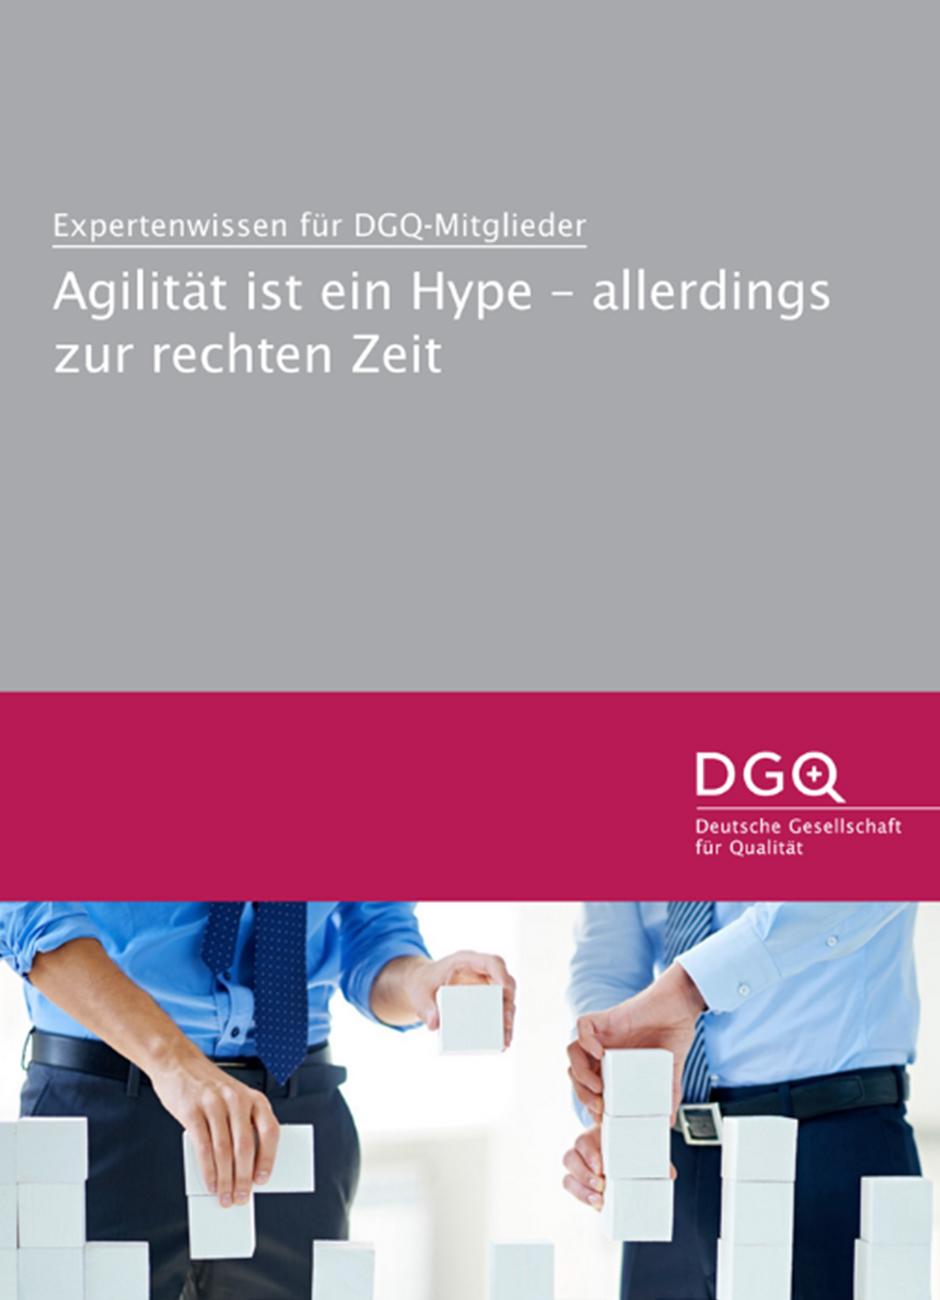 DGQ-Whitepaper: